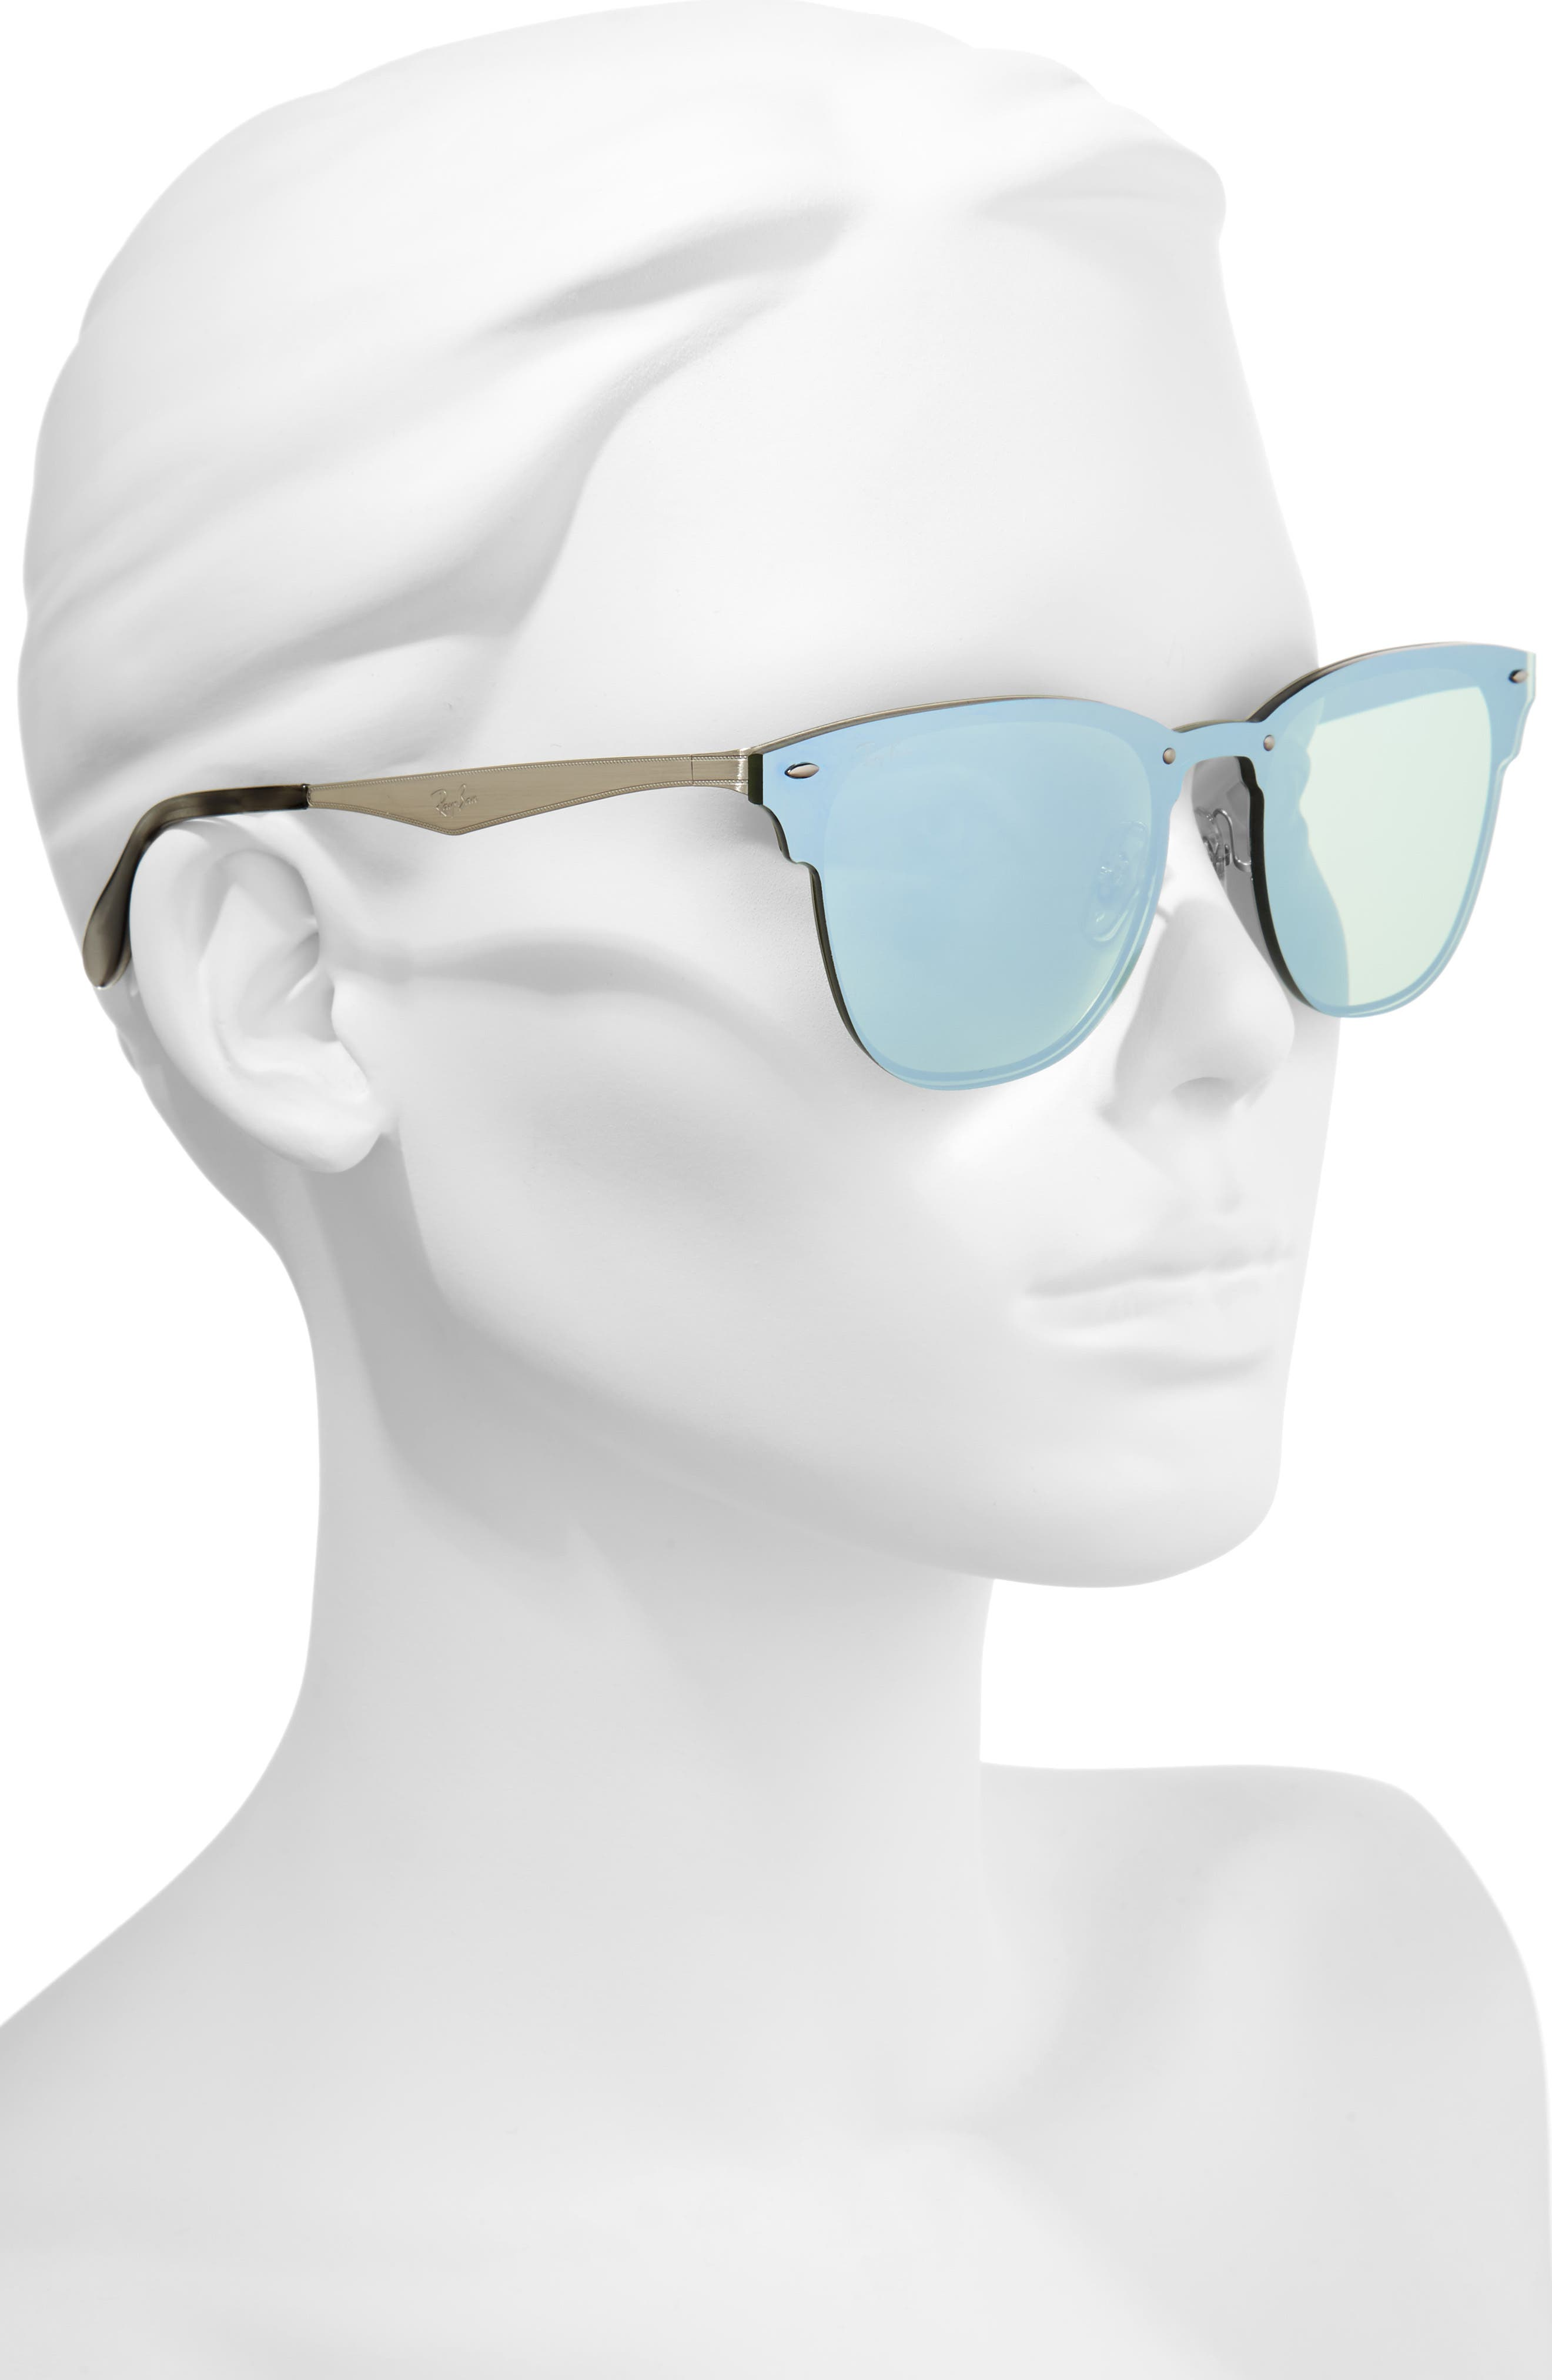 52mm Mirrored Sunglasses,                             Alternate thumbnail 2, color,                             040